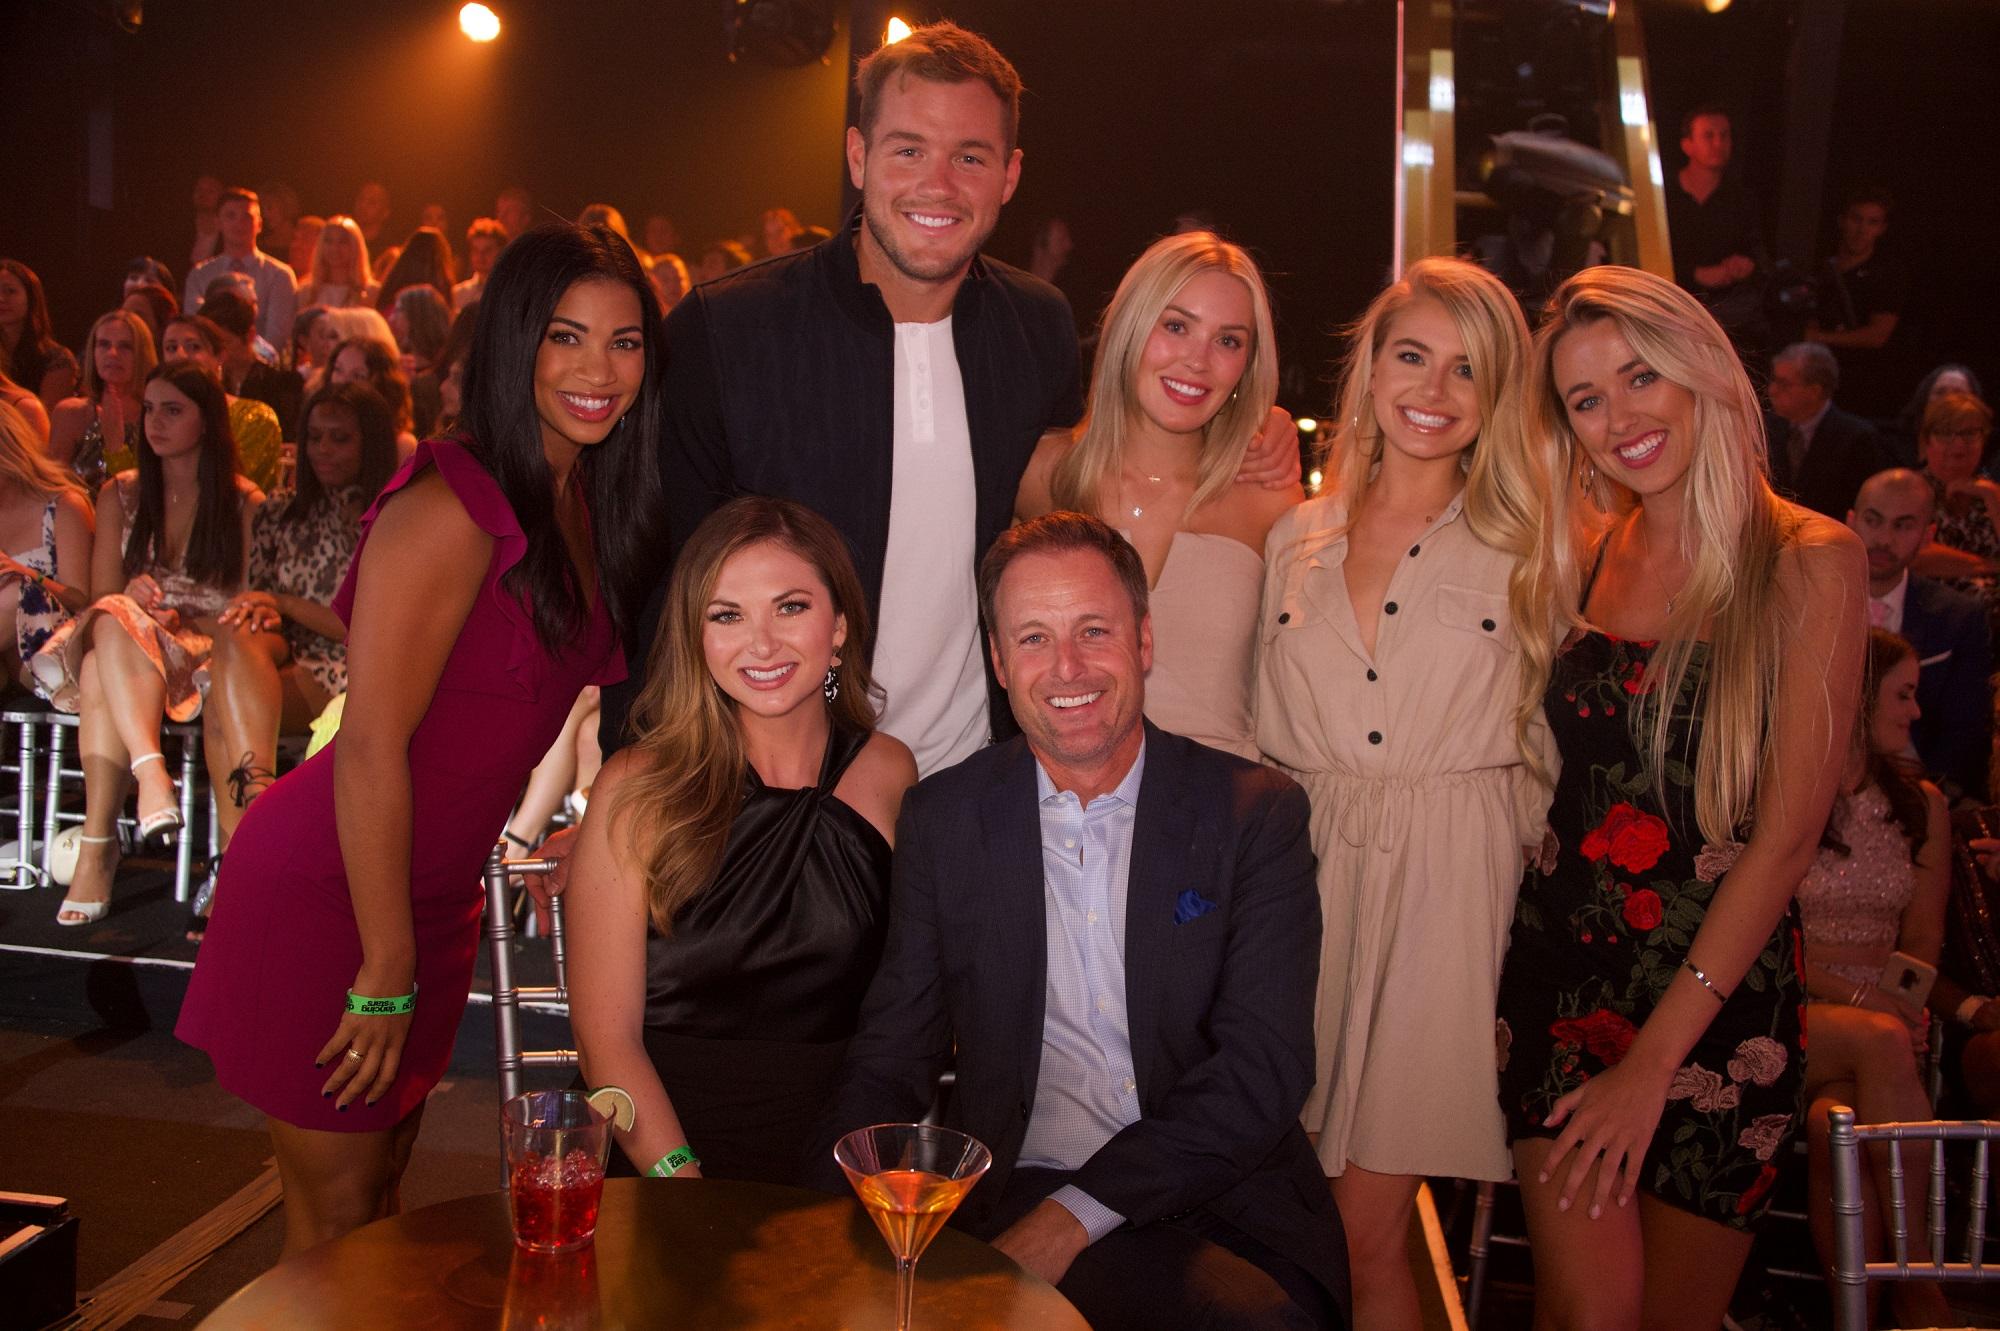 Chris Harrison with girlfriend Lauren Zima and contestants Katie Morton, Colton Underwood, Cassie Randolph, Demi Burnett, Heather Martin